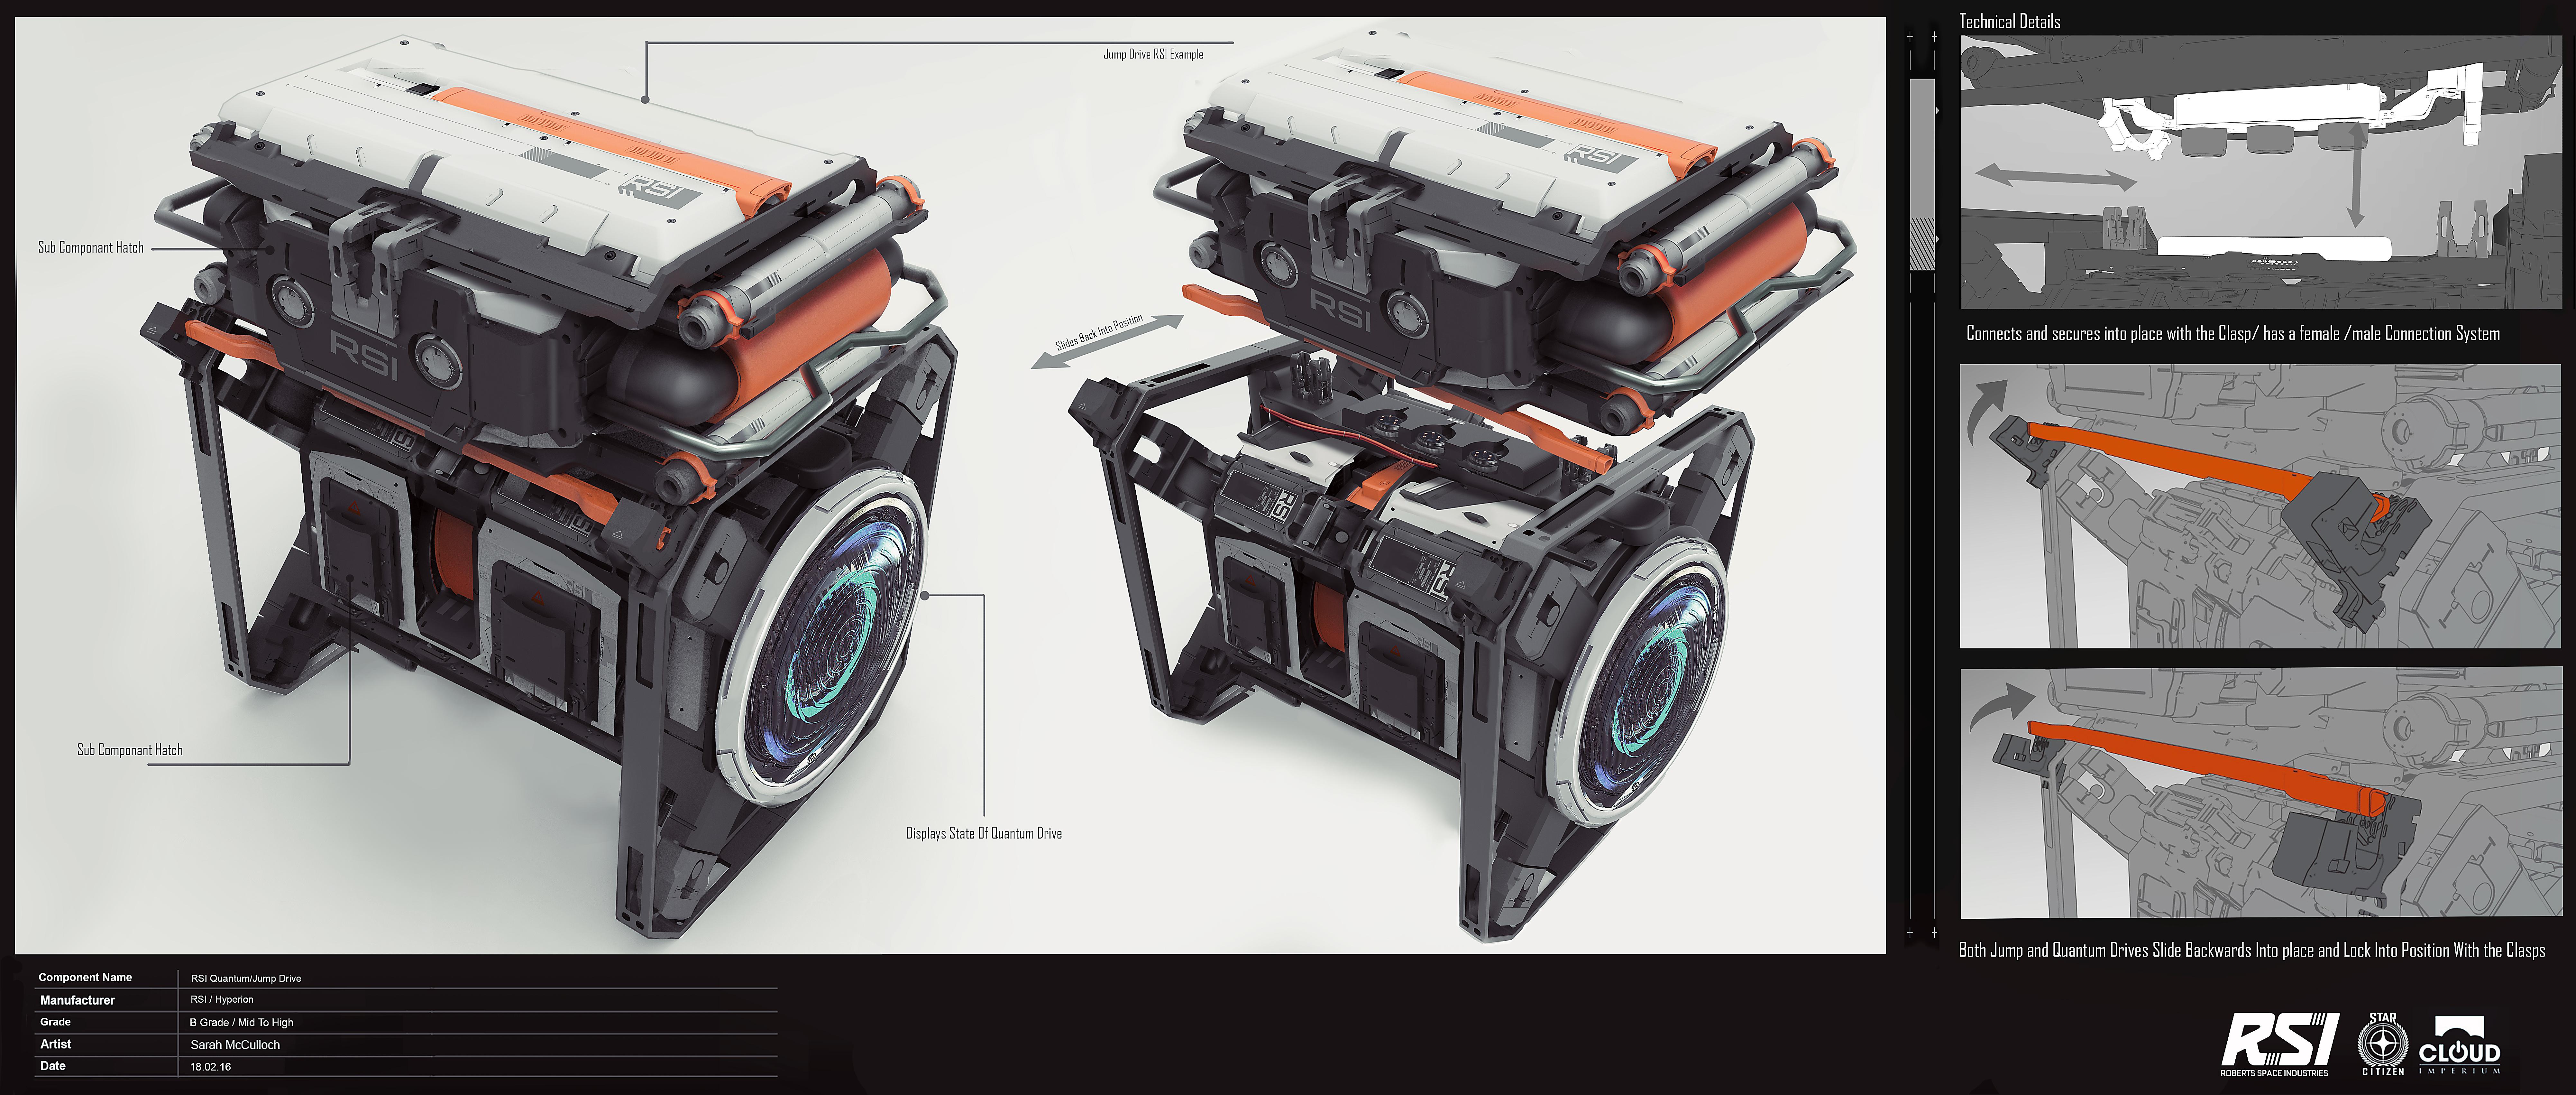 robertsspaceindustries.com/media/z0fyk81jmepesr/source/Quatum_Drive_RSI_Hyperion-Grade-B.jpg